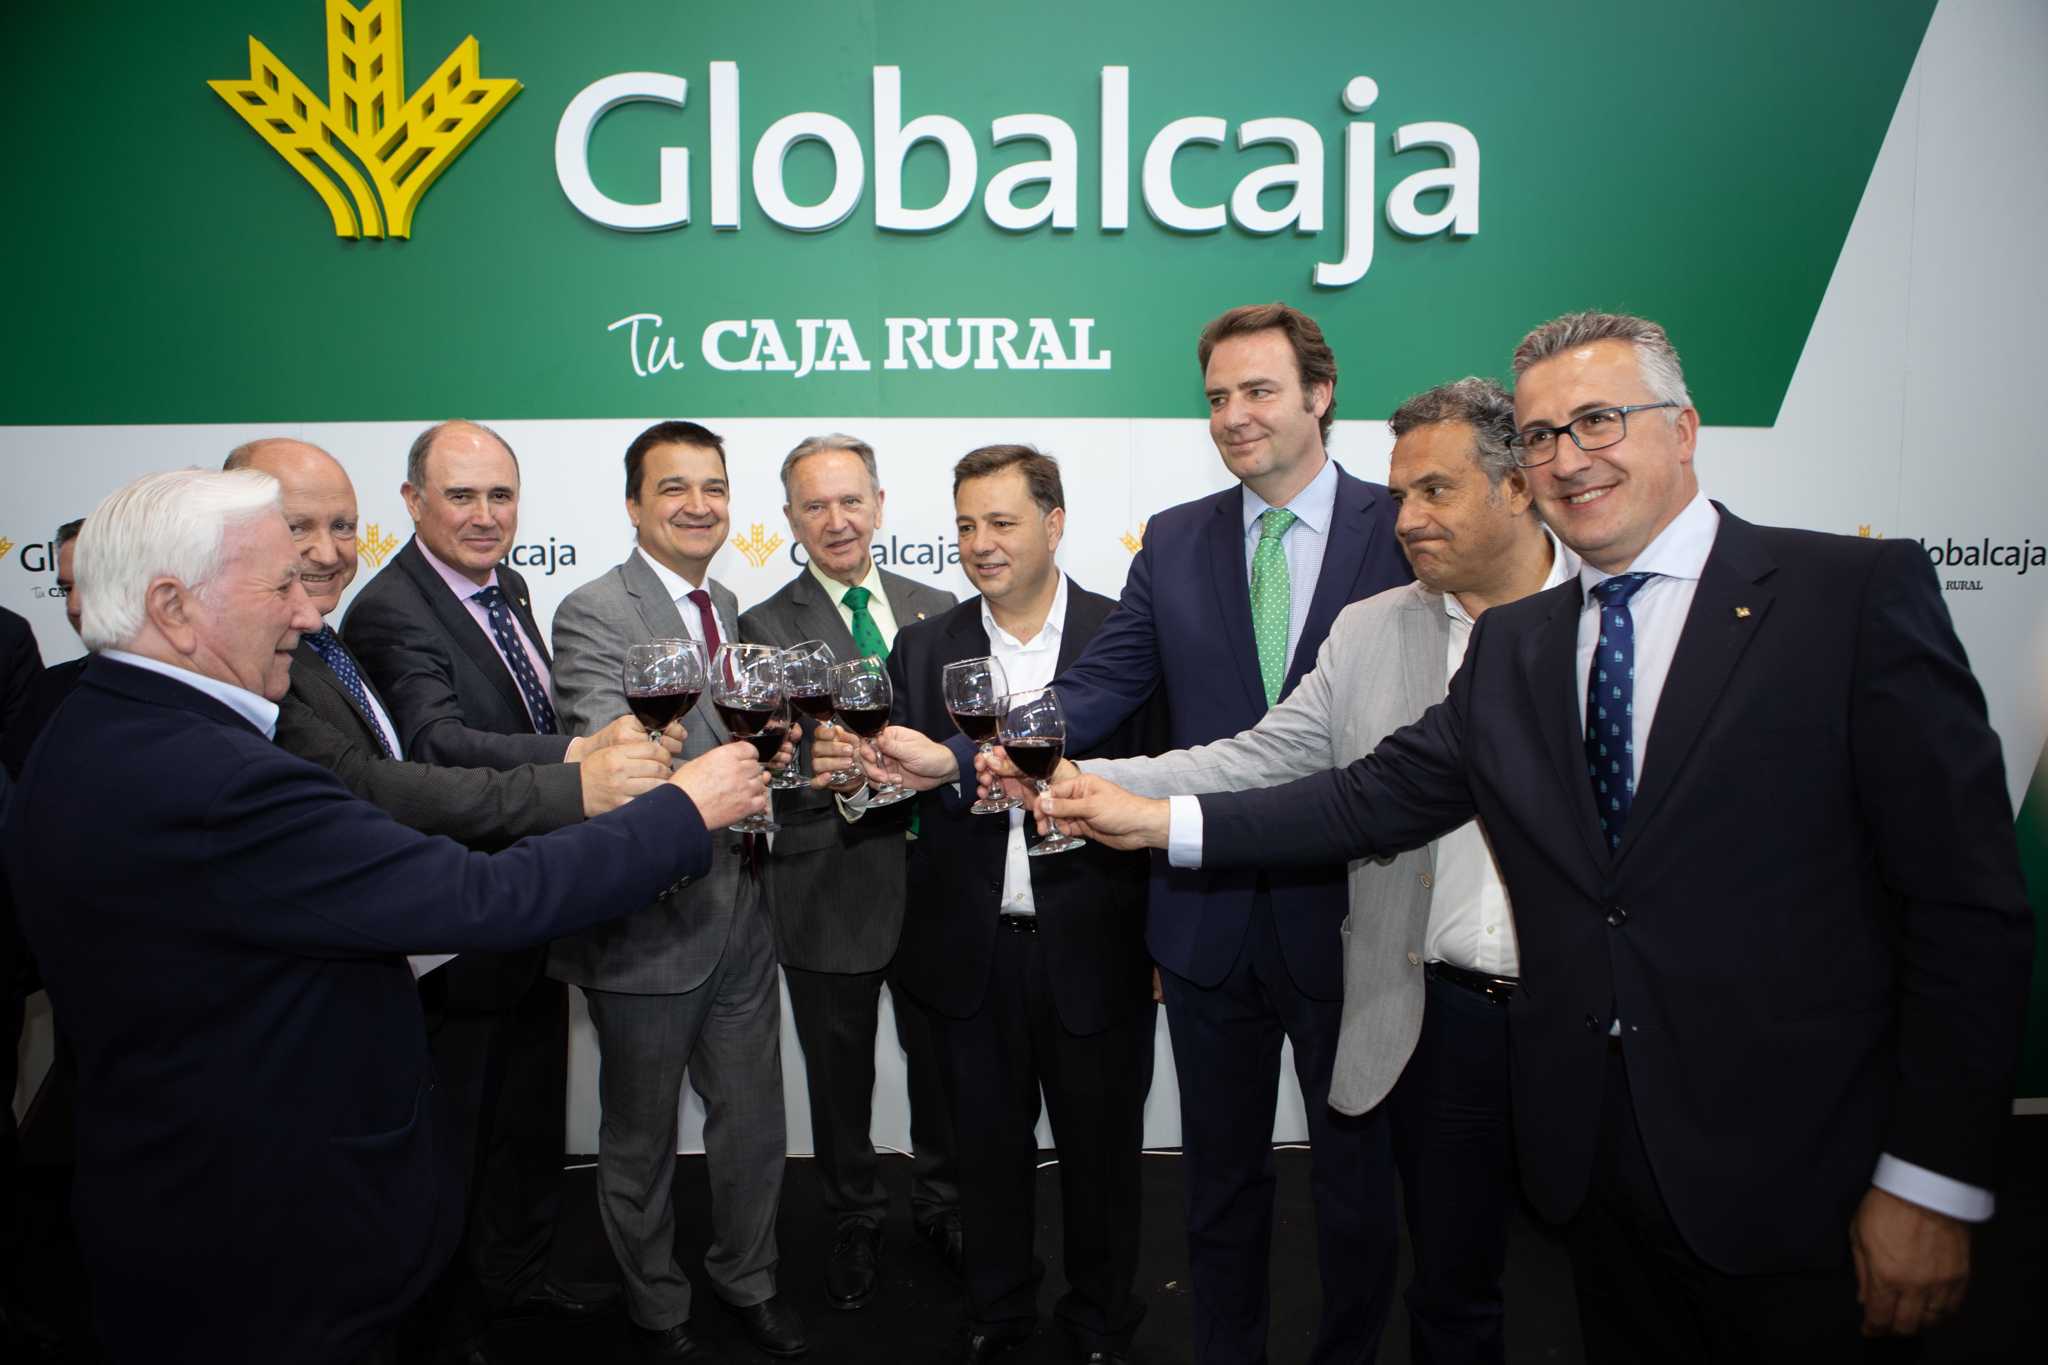 https://blog.globalcaja.es/wp-content/uploads/2019/05/Comida-hermandad-expovicamanjpg.jpg